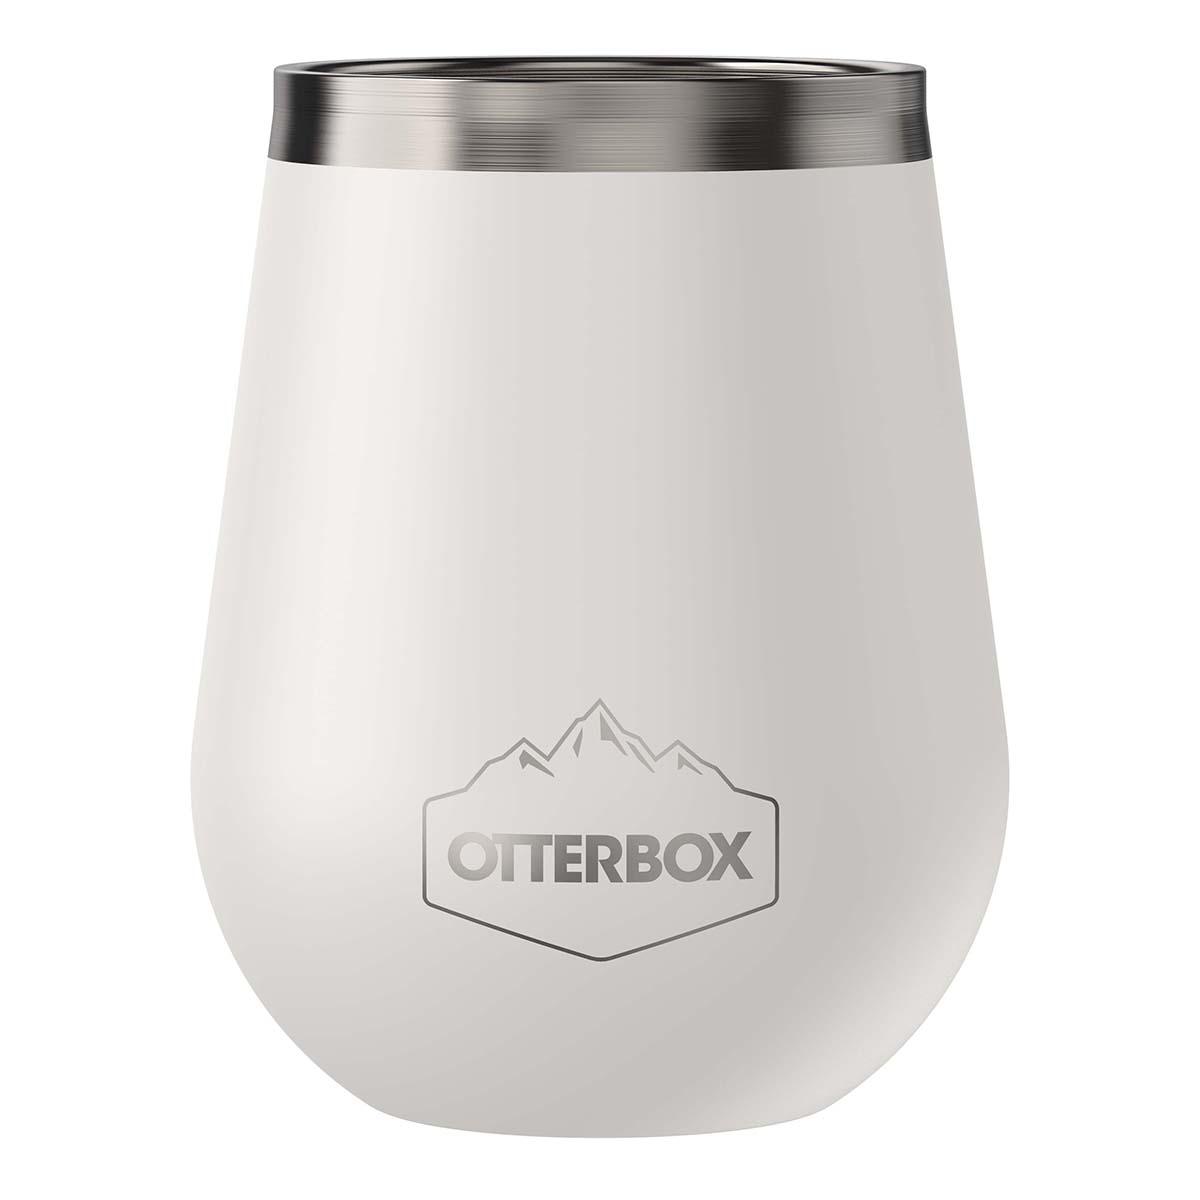 AIRMKT eCom OtterBox PN 77-60958 Wine_Tumbler_Back_IceCap WEB